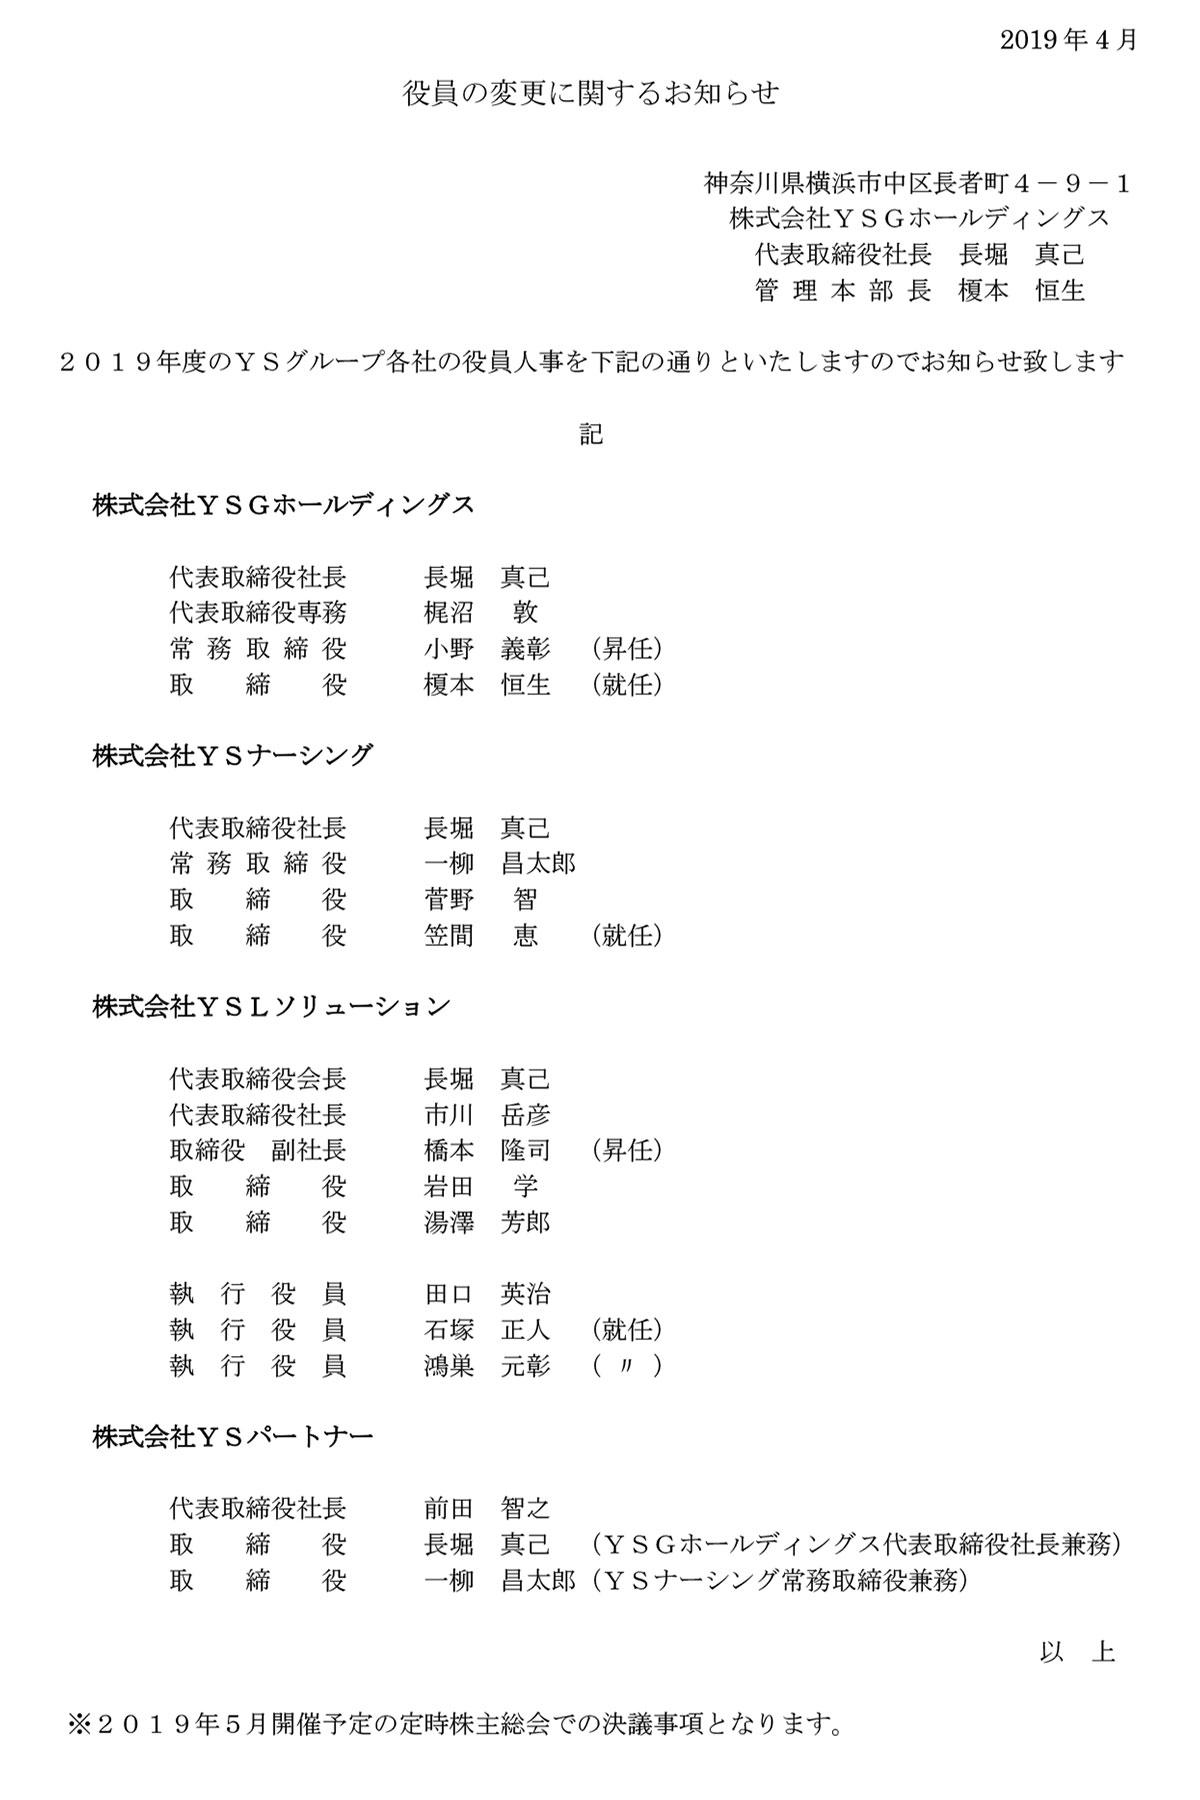 yakuin_henkou_YSG201605